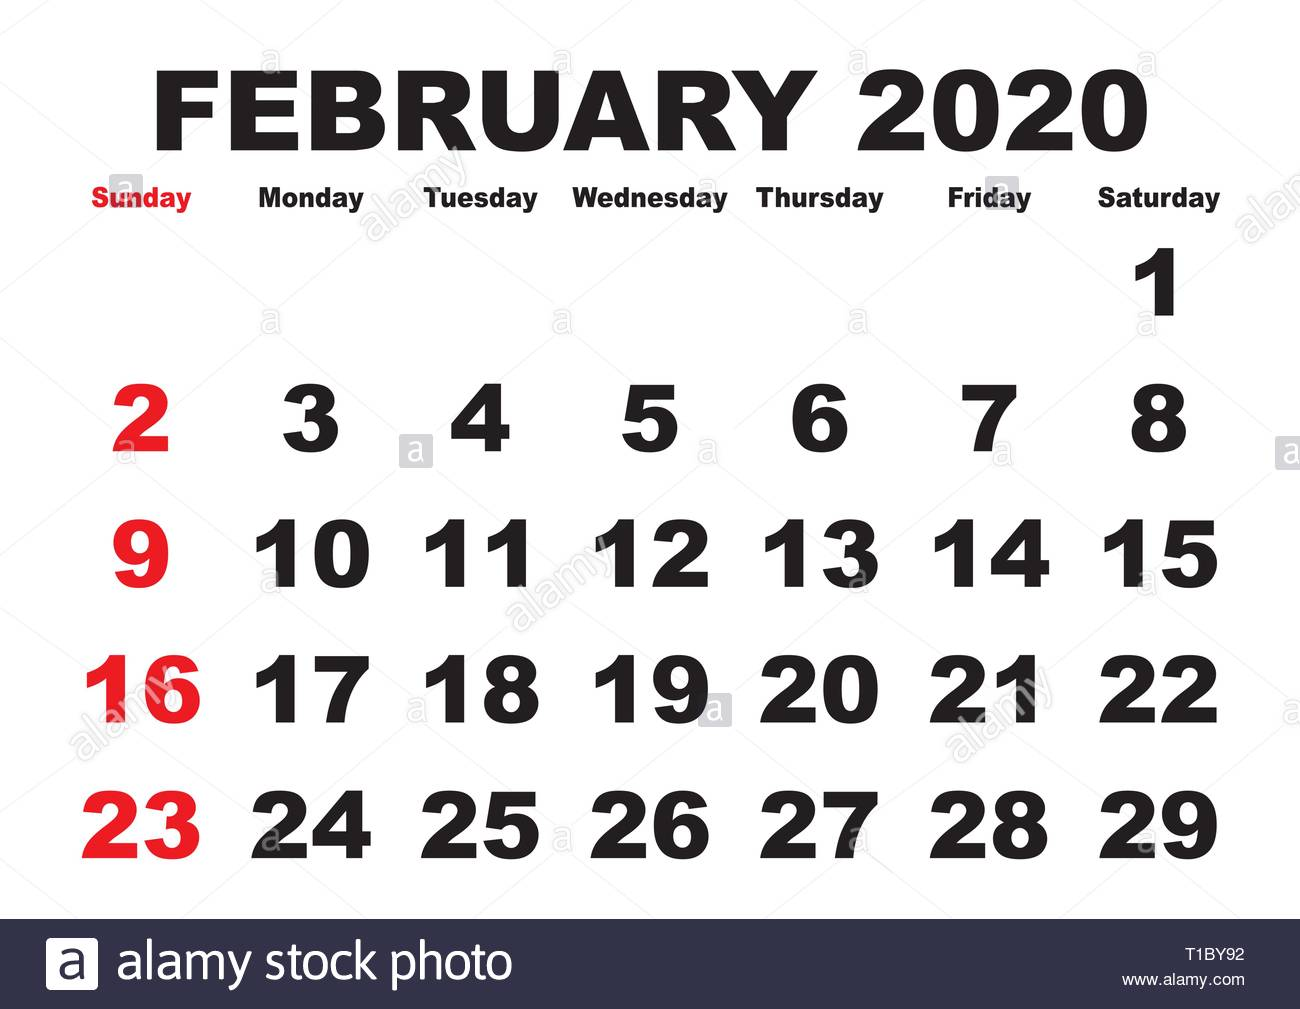 Febbraio Calendario 2020.2020 Calendario Mese Di Febbraio Vettore Calendario